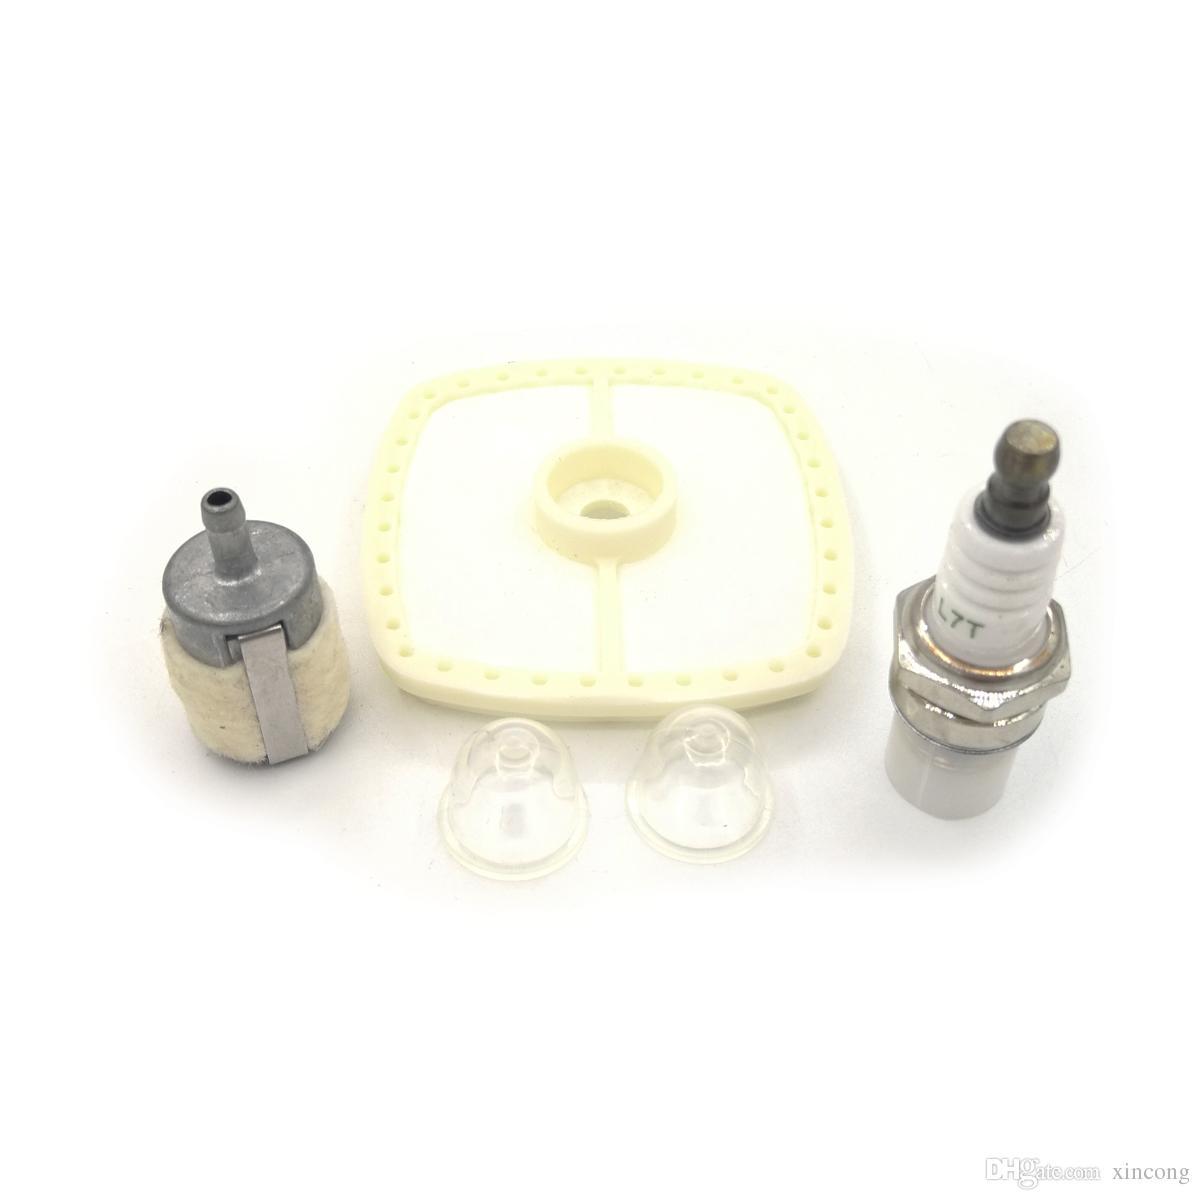 2018 Air Filter Spark Plug Primer Bulb Fuel Filter For ECHO PB250 PE230  PE231 PPF210 SRM210 SRM211 HC160 HC200 HC225 HC1600 Trimmer From Xincong,  ...